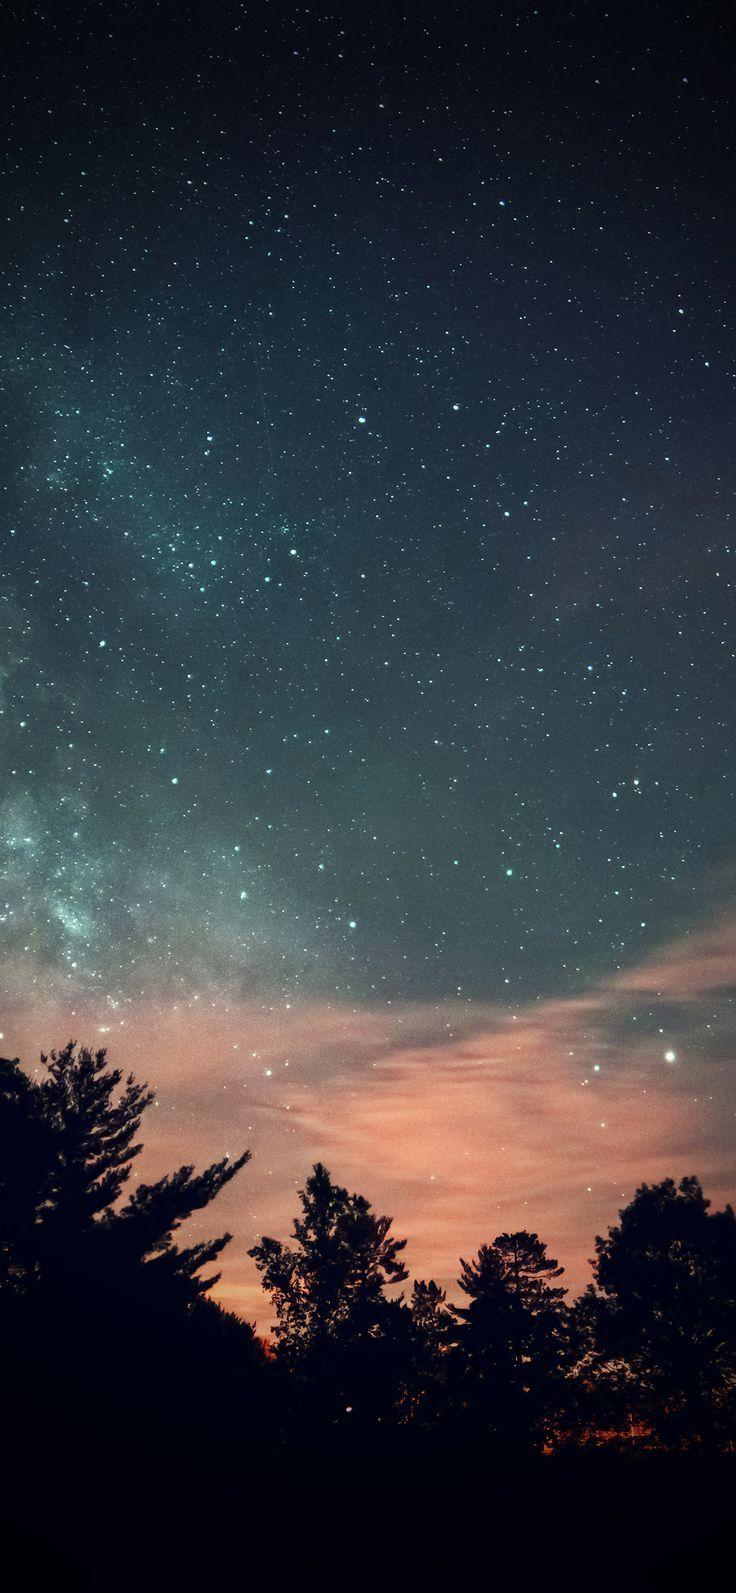 mv75-himmel-nacht-stern-dunkel-berg-wolken-vignette via iPhoneXpapers.com - Wallpap ... #darkiphonewallpaper